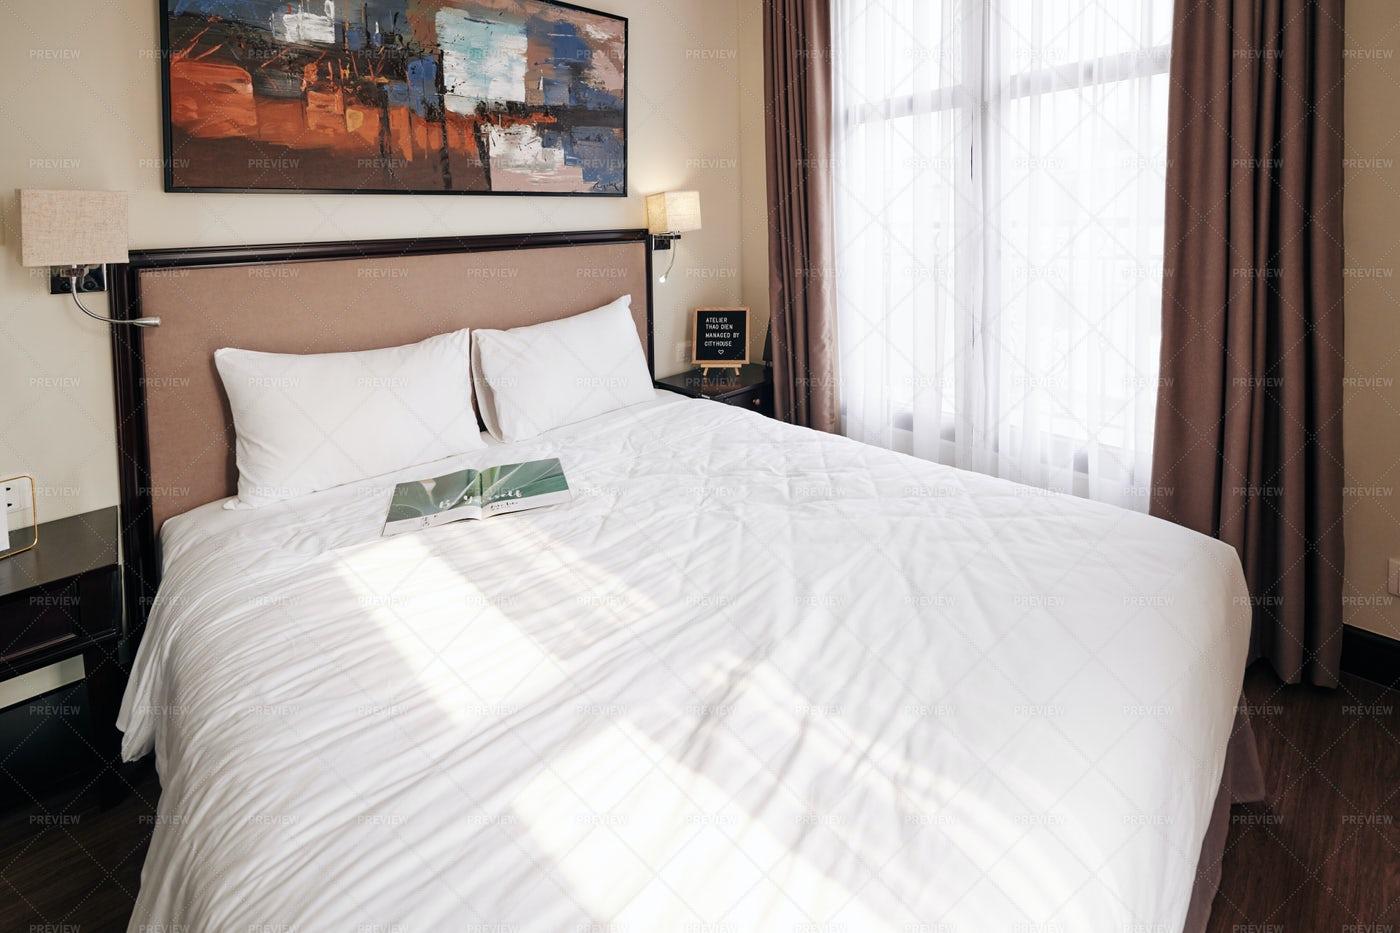 Queen Size Bed In Hotel Room: Stock Photos